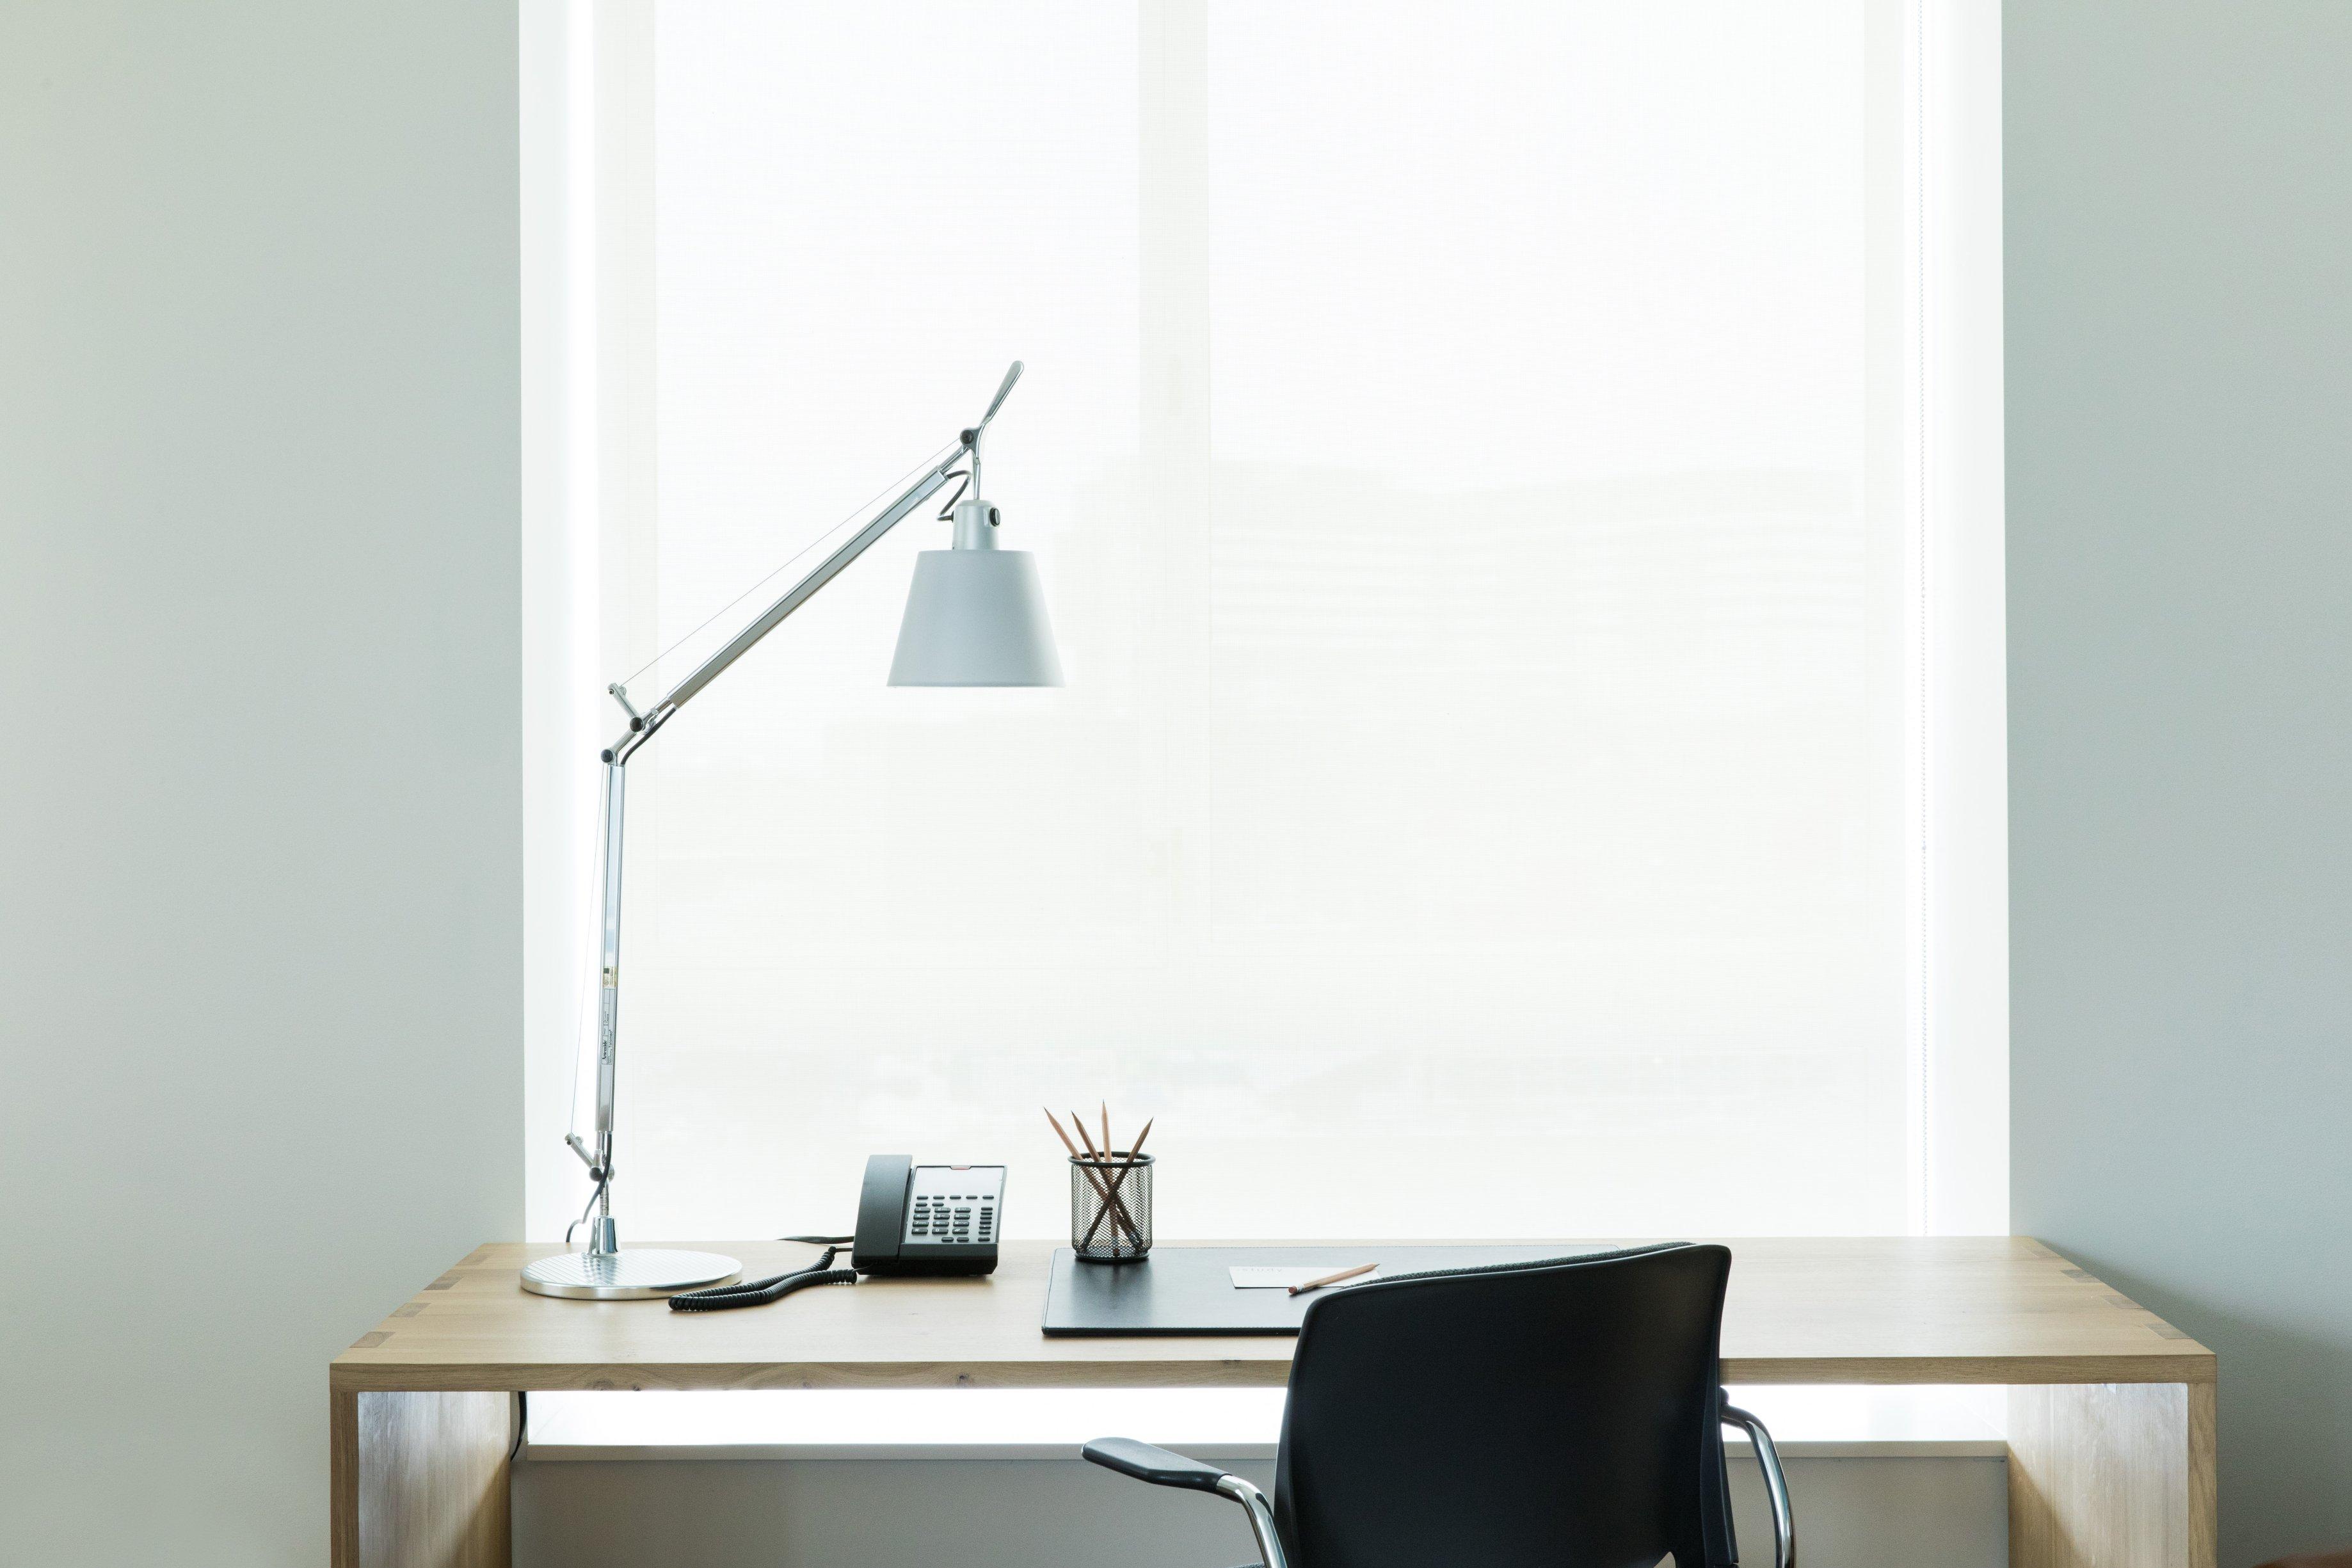 170228134340-study-hotels-desk.jpg